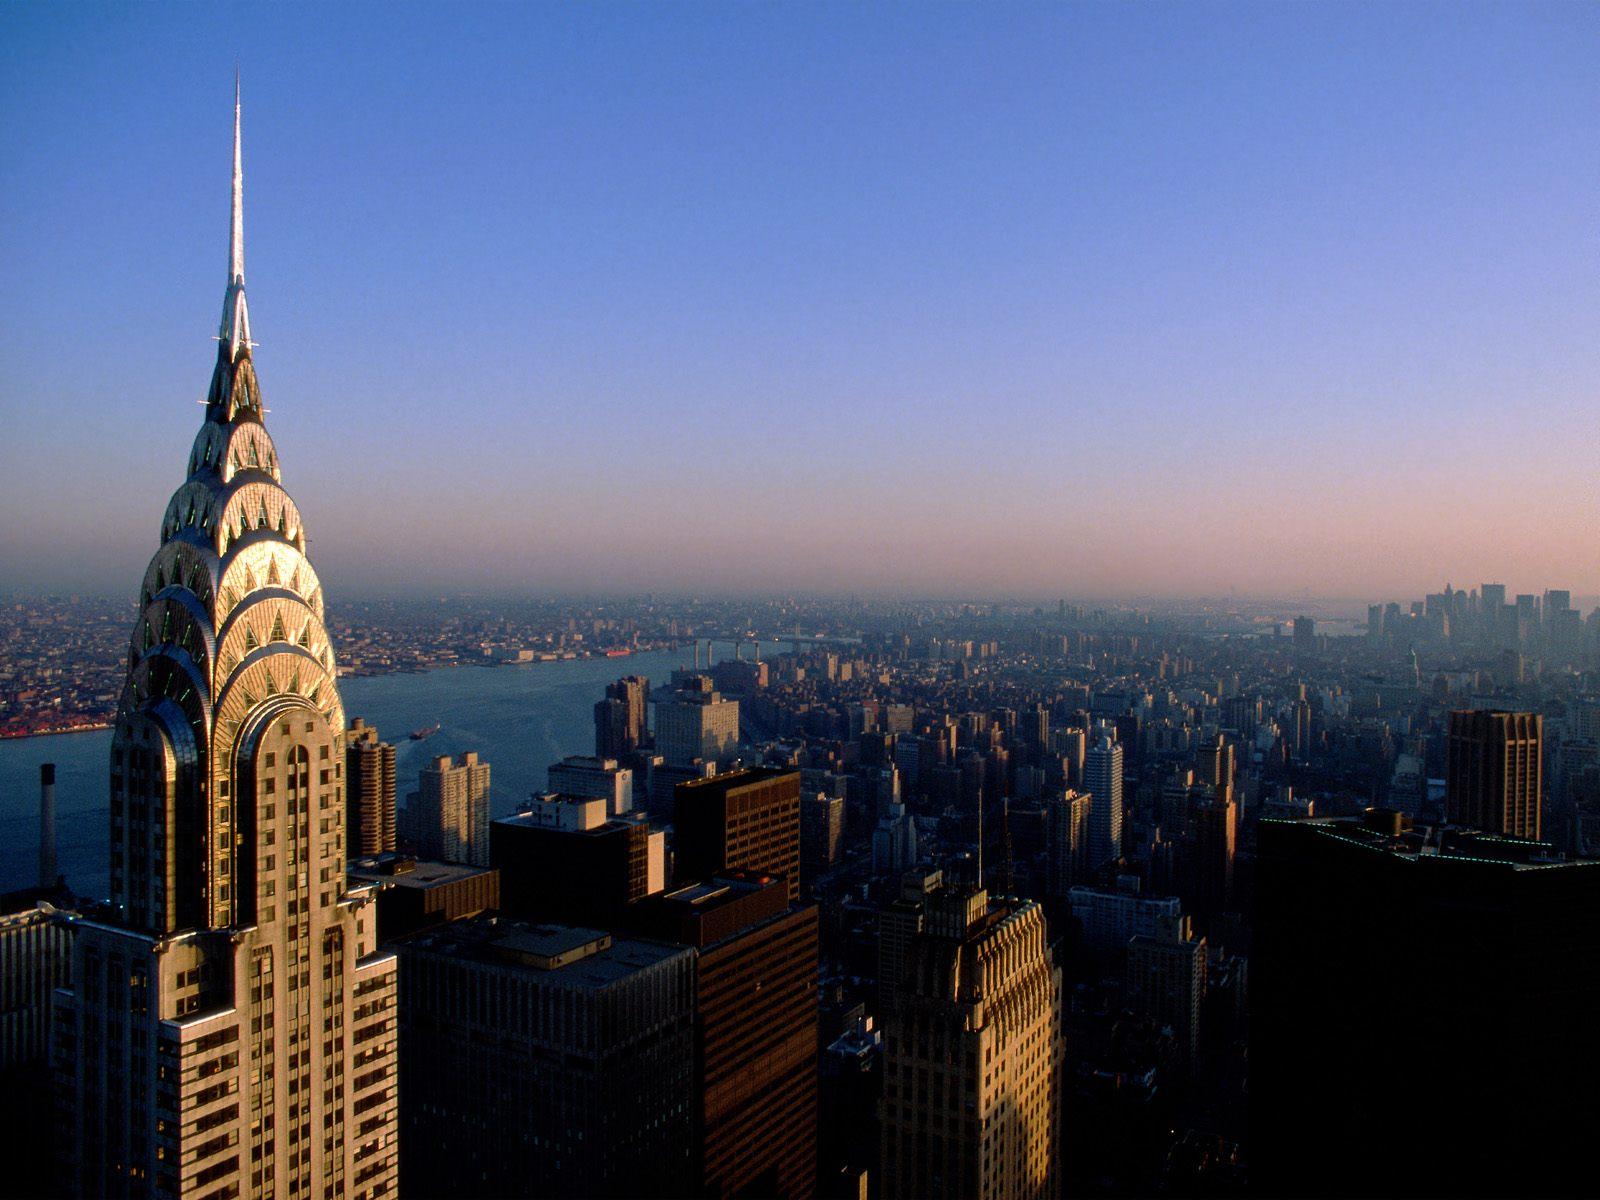 http://1.bp.blogspot.com/-j15gNzXsbgo/TeEEj0G0LVI/AAAAAAAAAMY/QeG-cldYGZo/s1600/new-york-foto-pictures-travel-viaggi-5.jpg